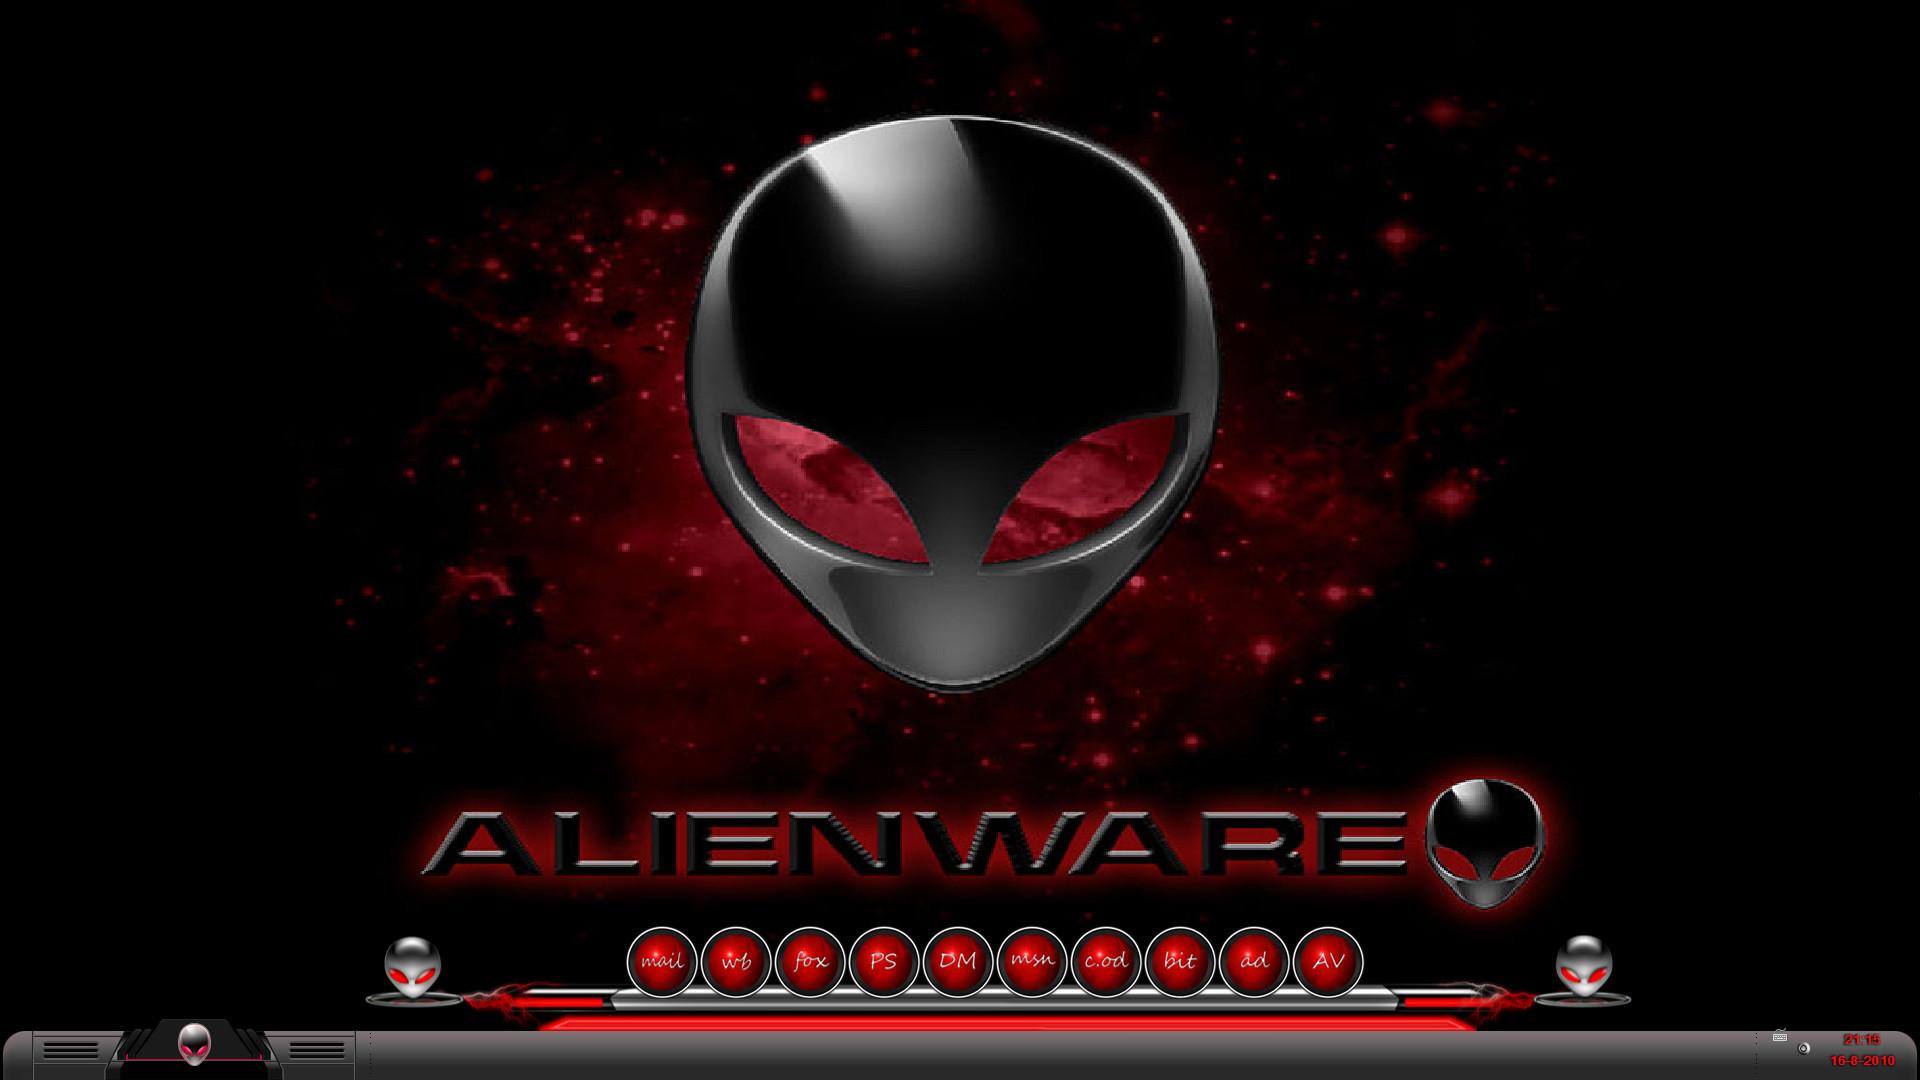 Alienware wallpapers for windows 7 wallpapersafari - 1920x1200 Alienware Wallpaper 1920x1080 Wallpapersafari